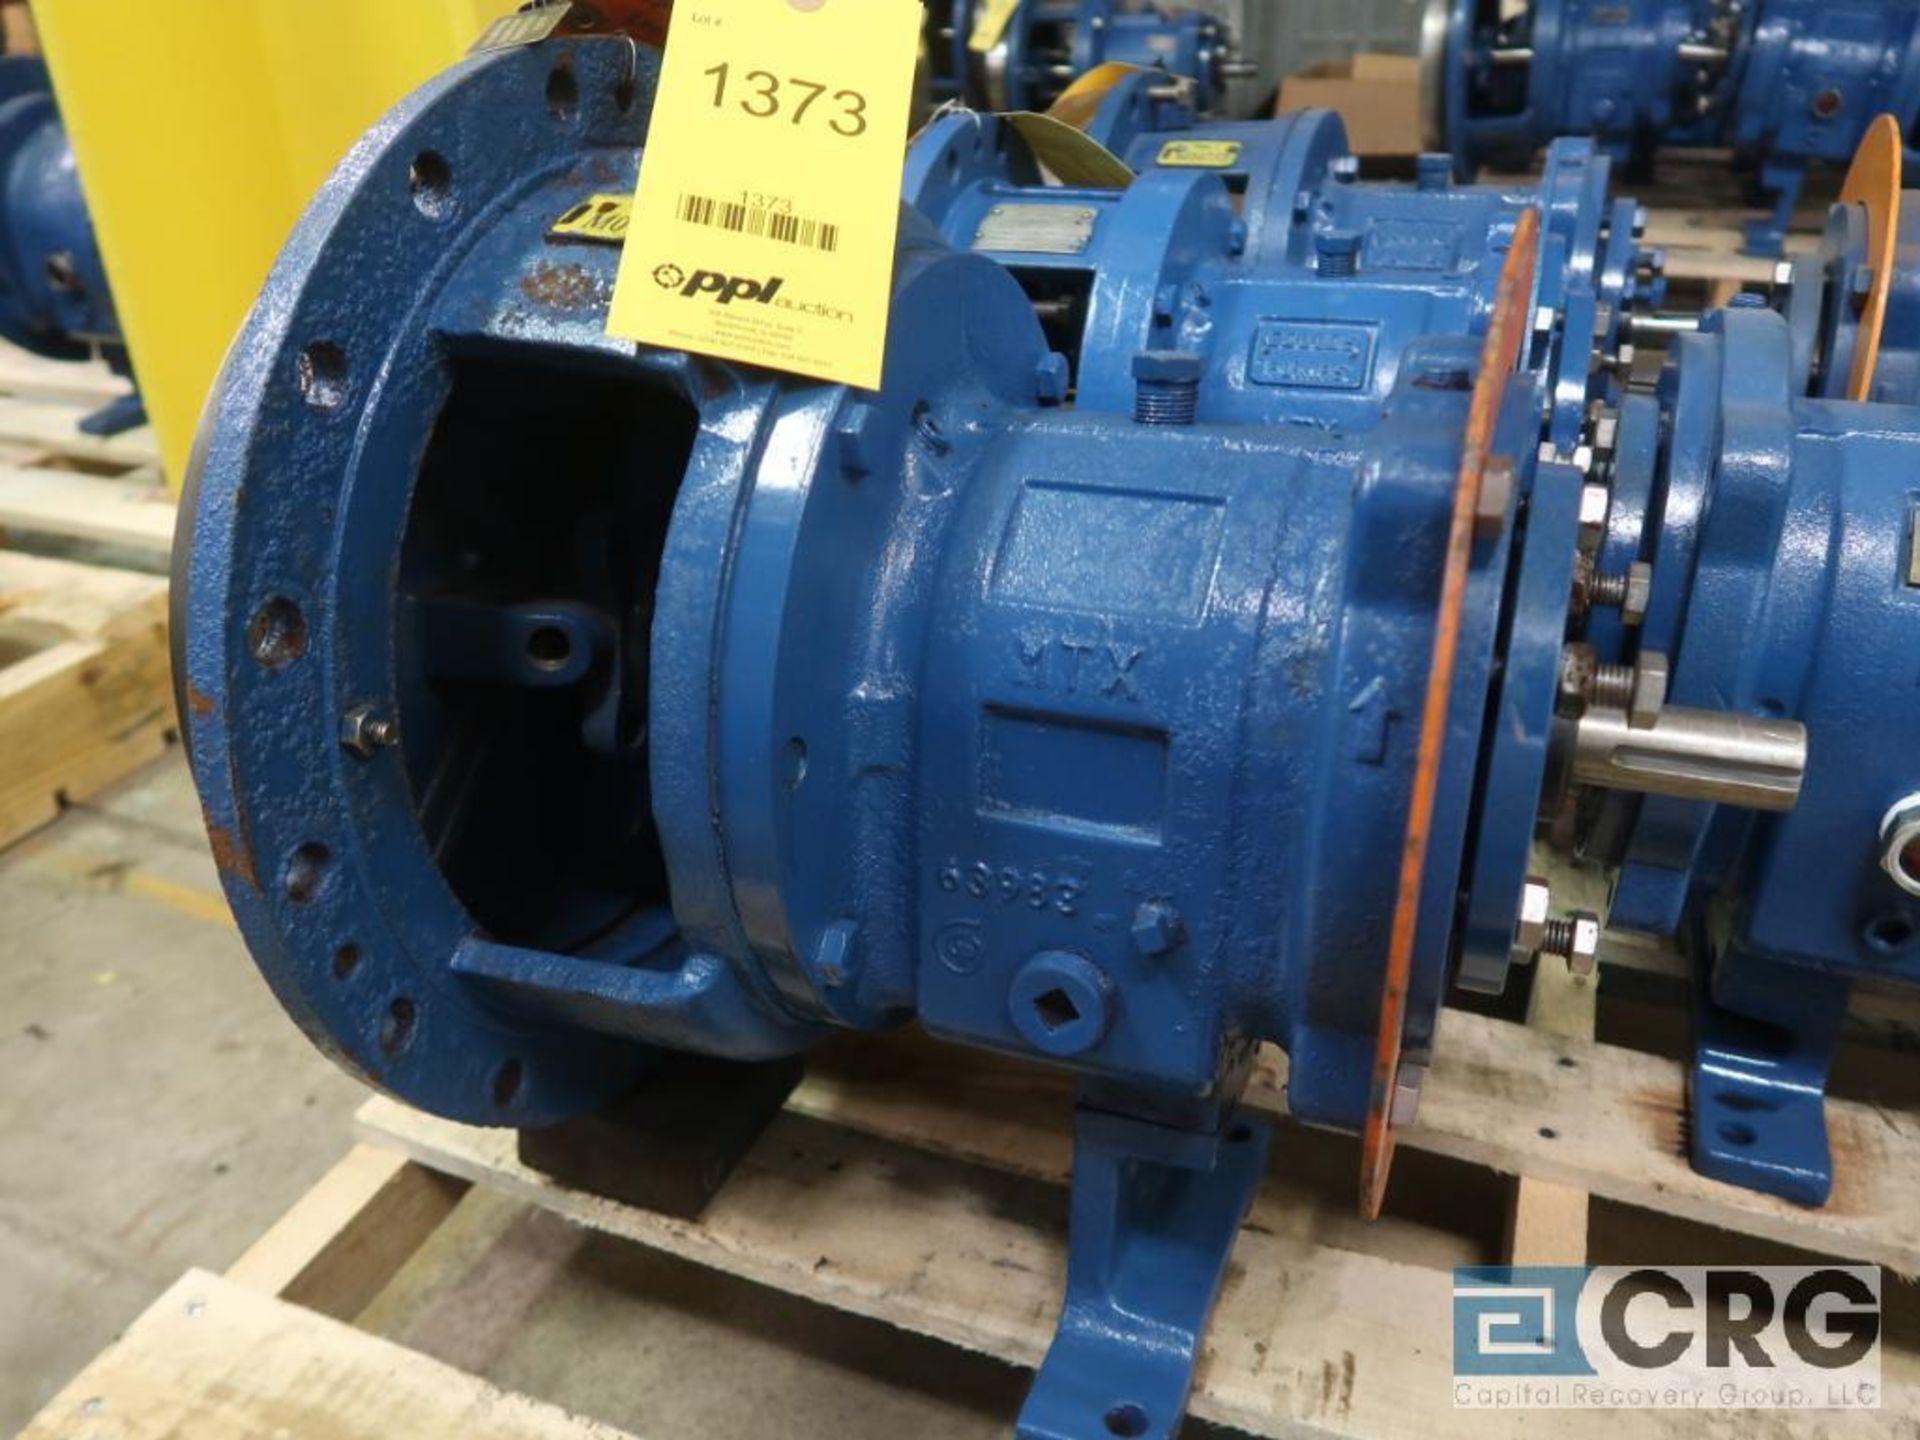 Goulds 3196 MTX 13 in. pump (Basement Stores)